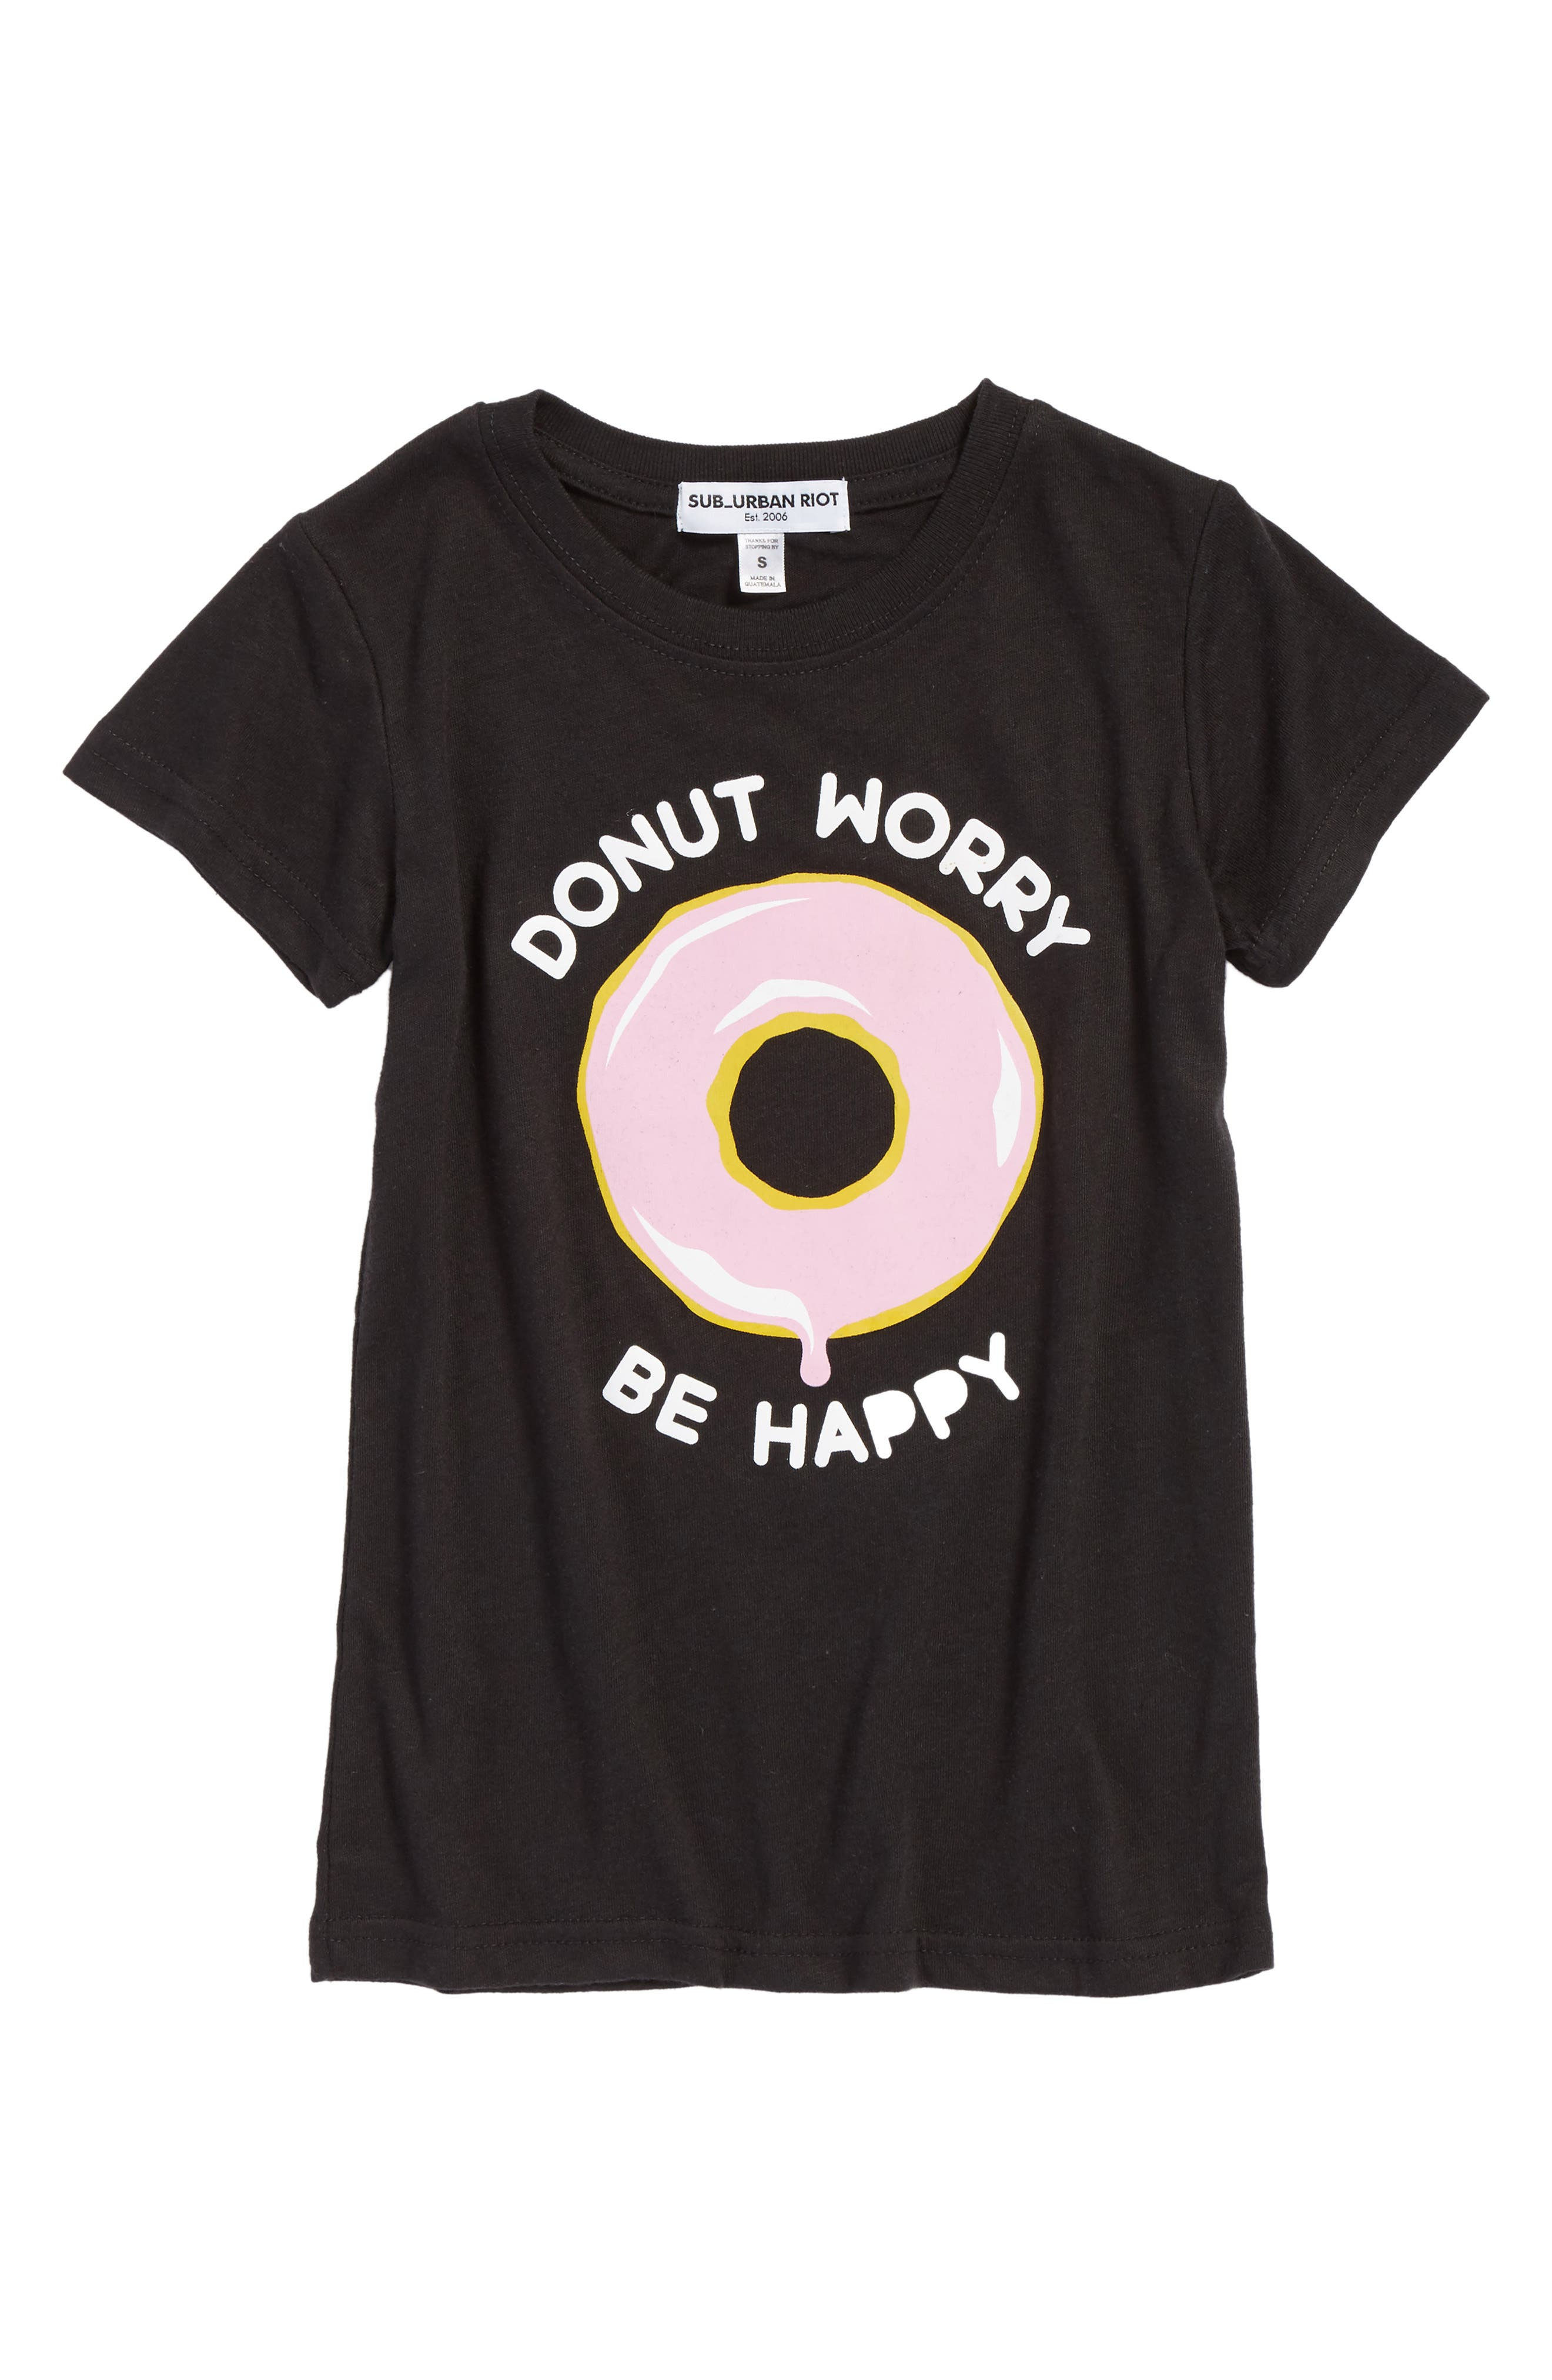 Main Image - Sub_Urban Riot Donut Worry Graphic Tee (Big Girls)